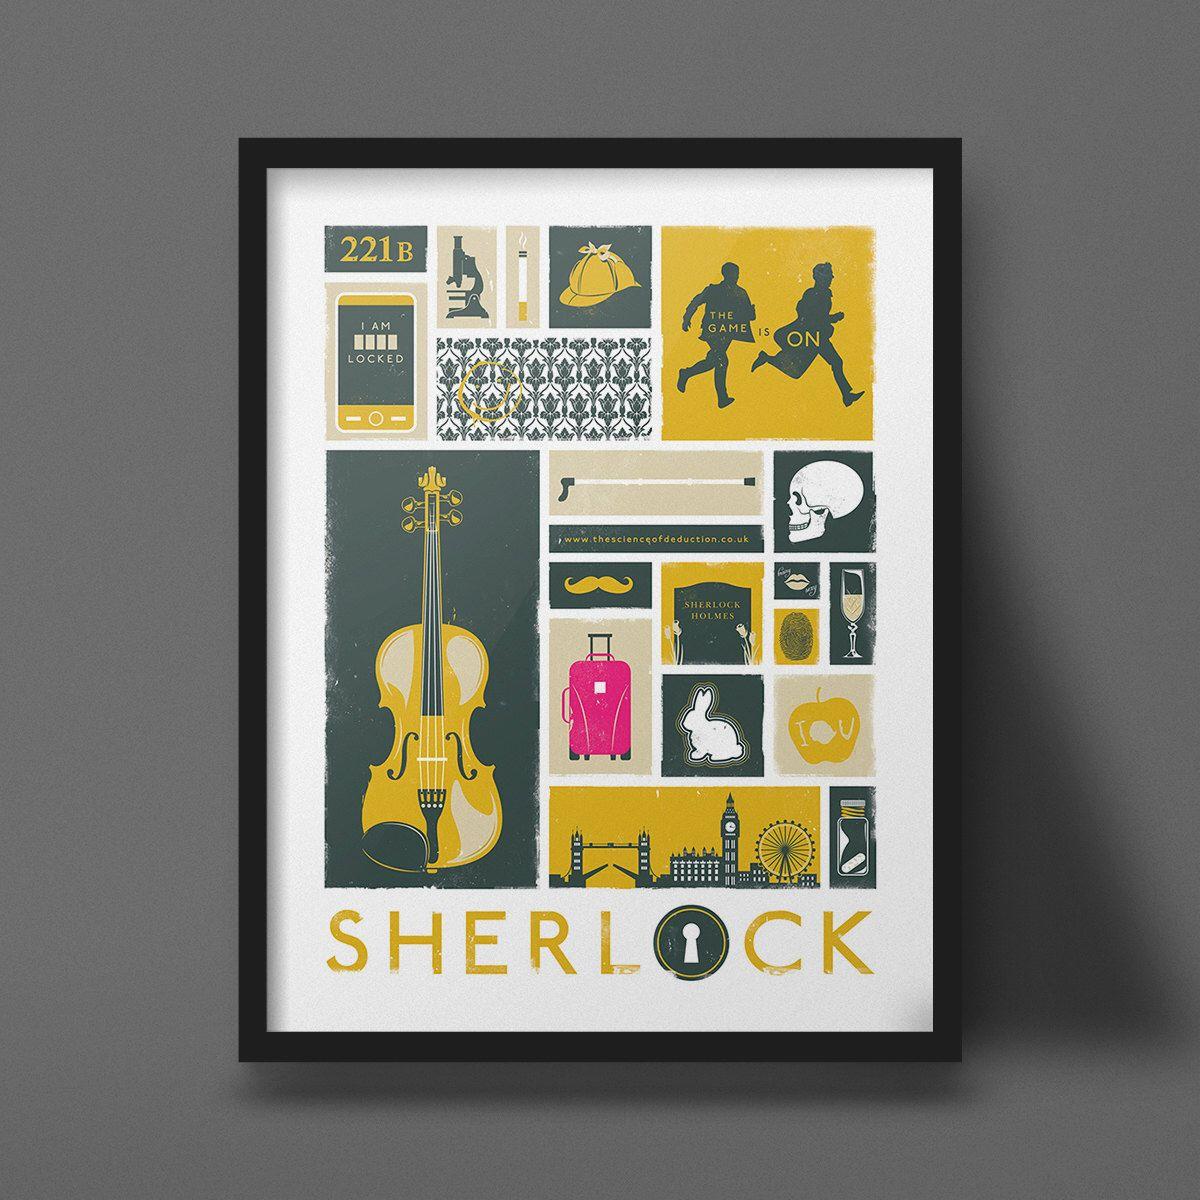 Sherlock Poster Art Modern Design Print by